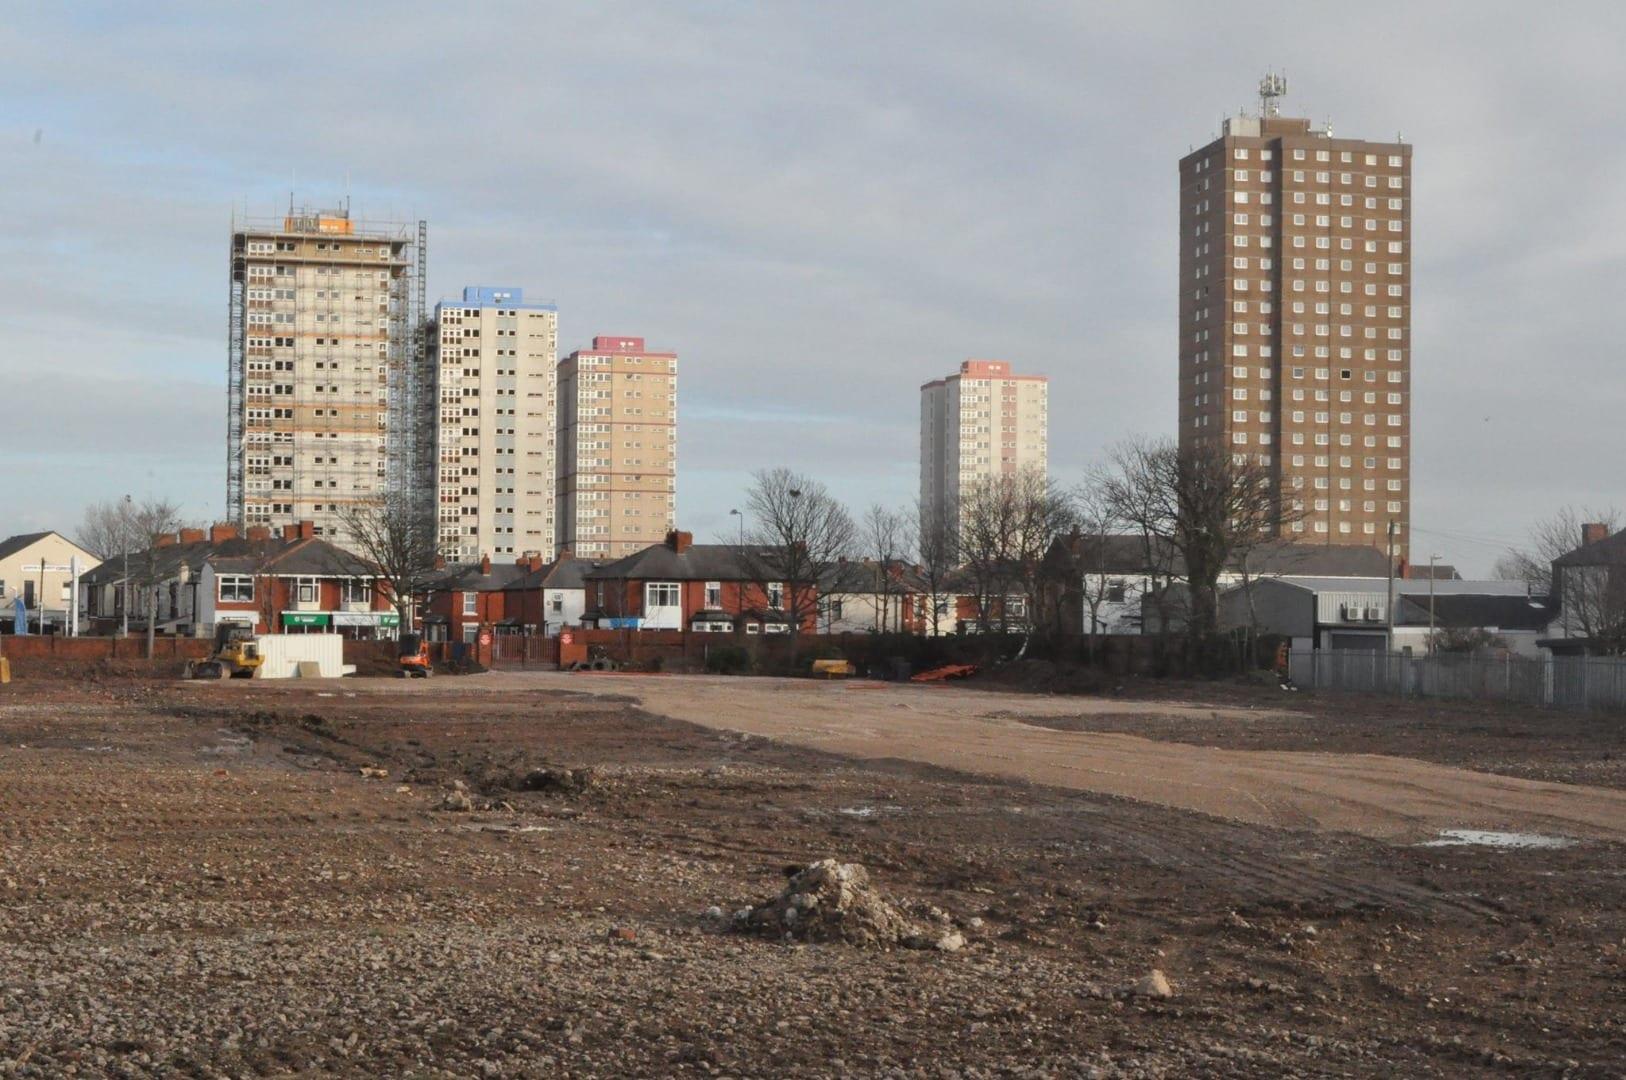 The five blocks of the Queens Park flats before demolition began